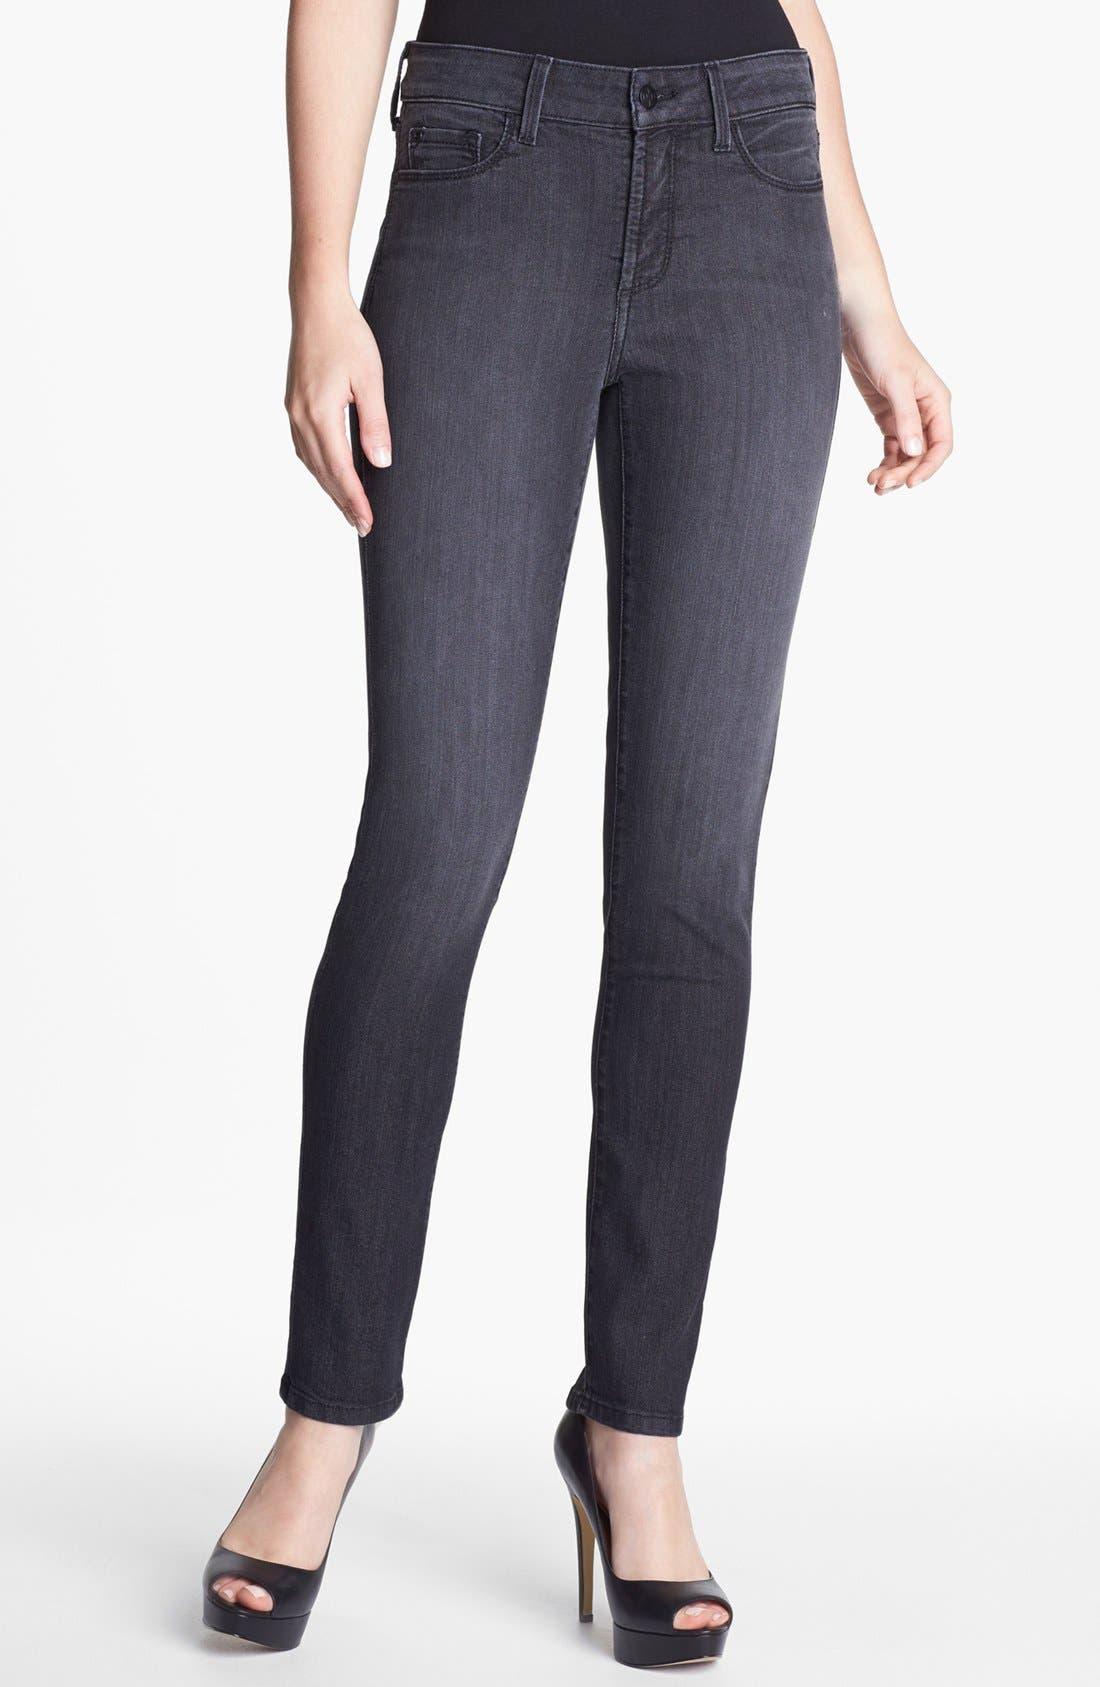 Main Image - NYDJ 'Alina' Stretch Skinny Jeans